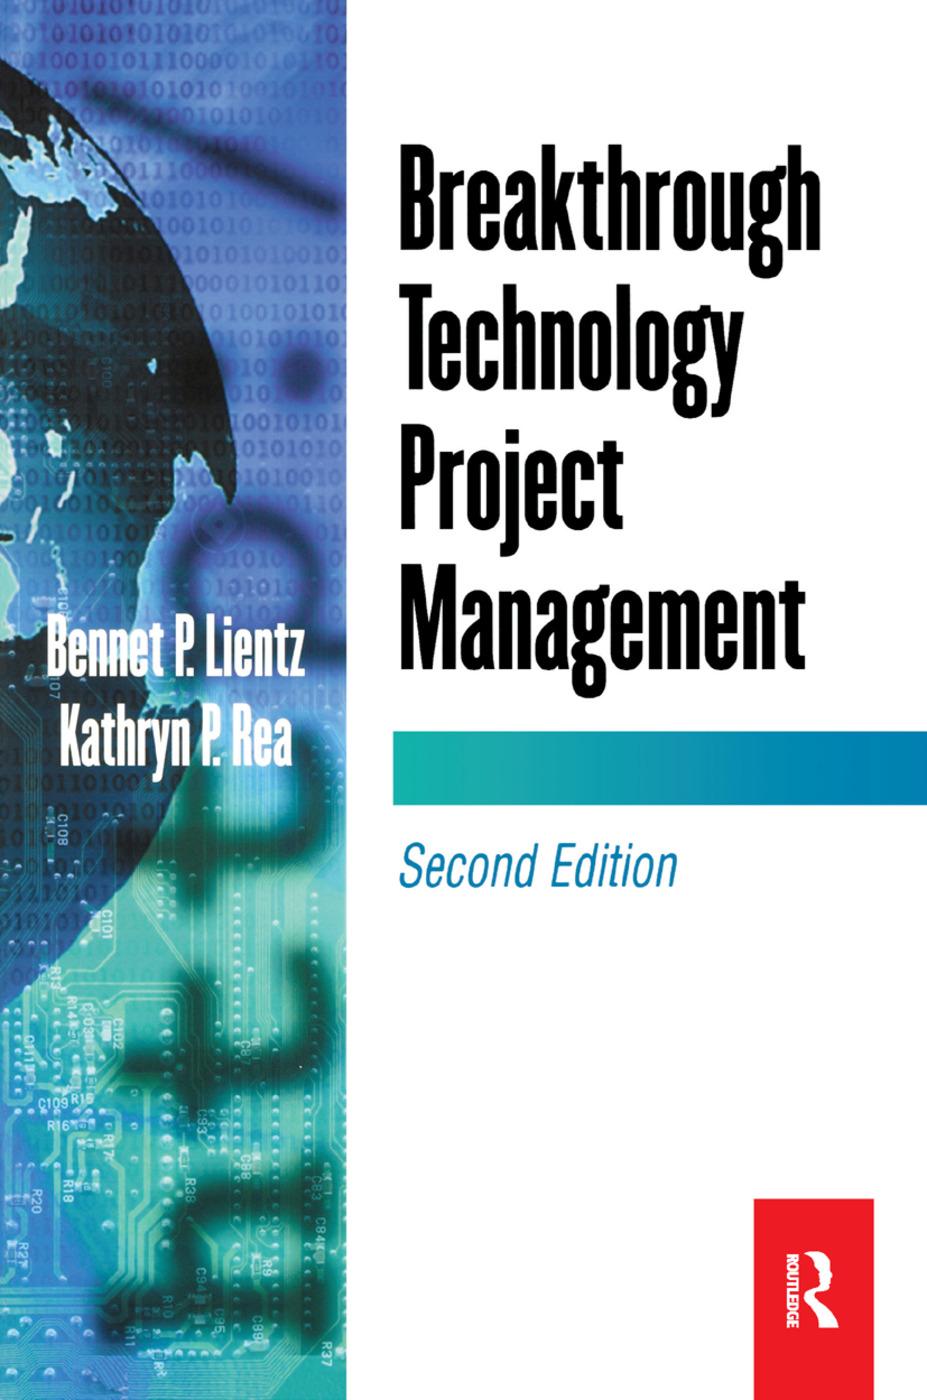 Breakthrough Technology Project Management